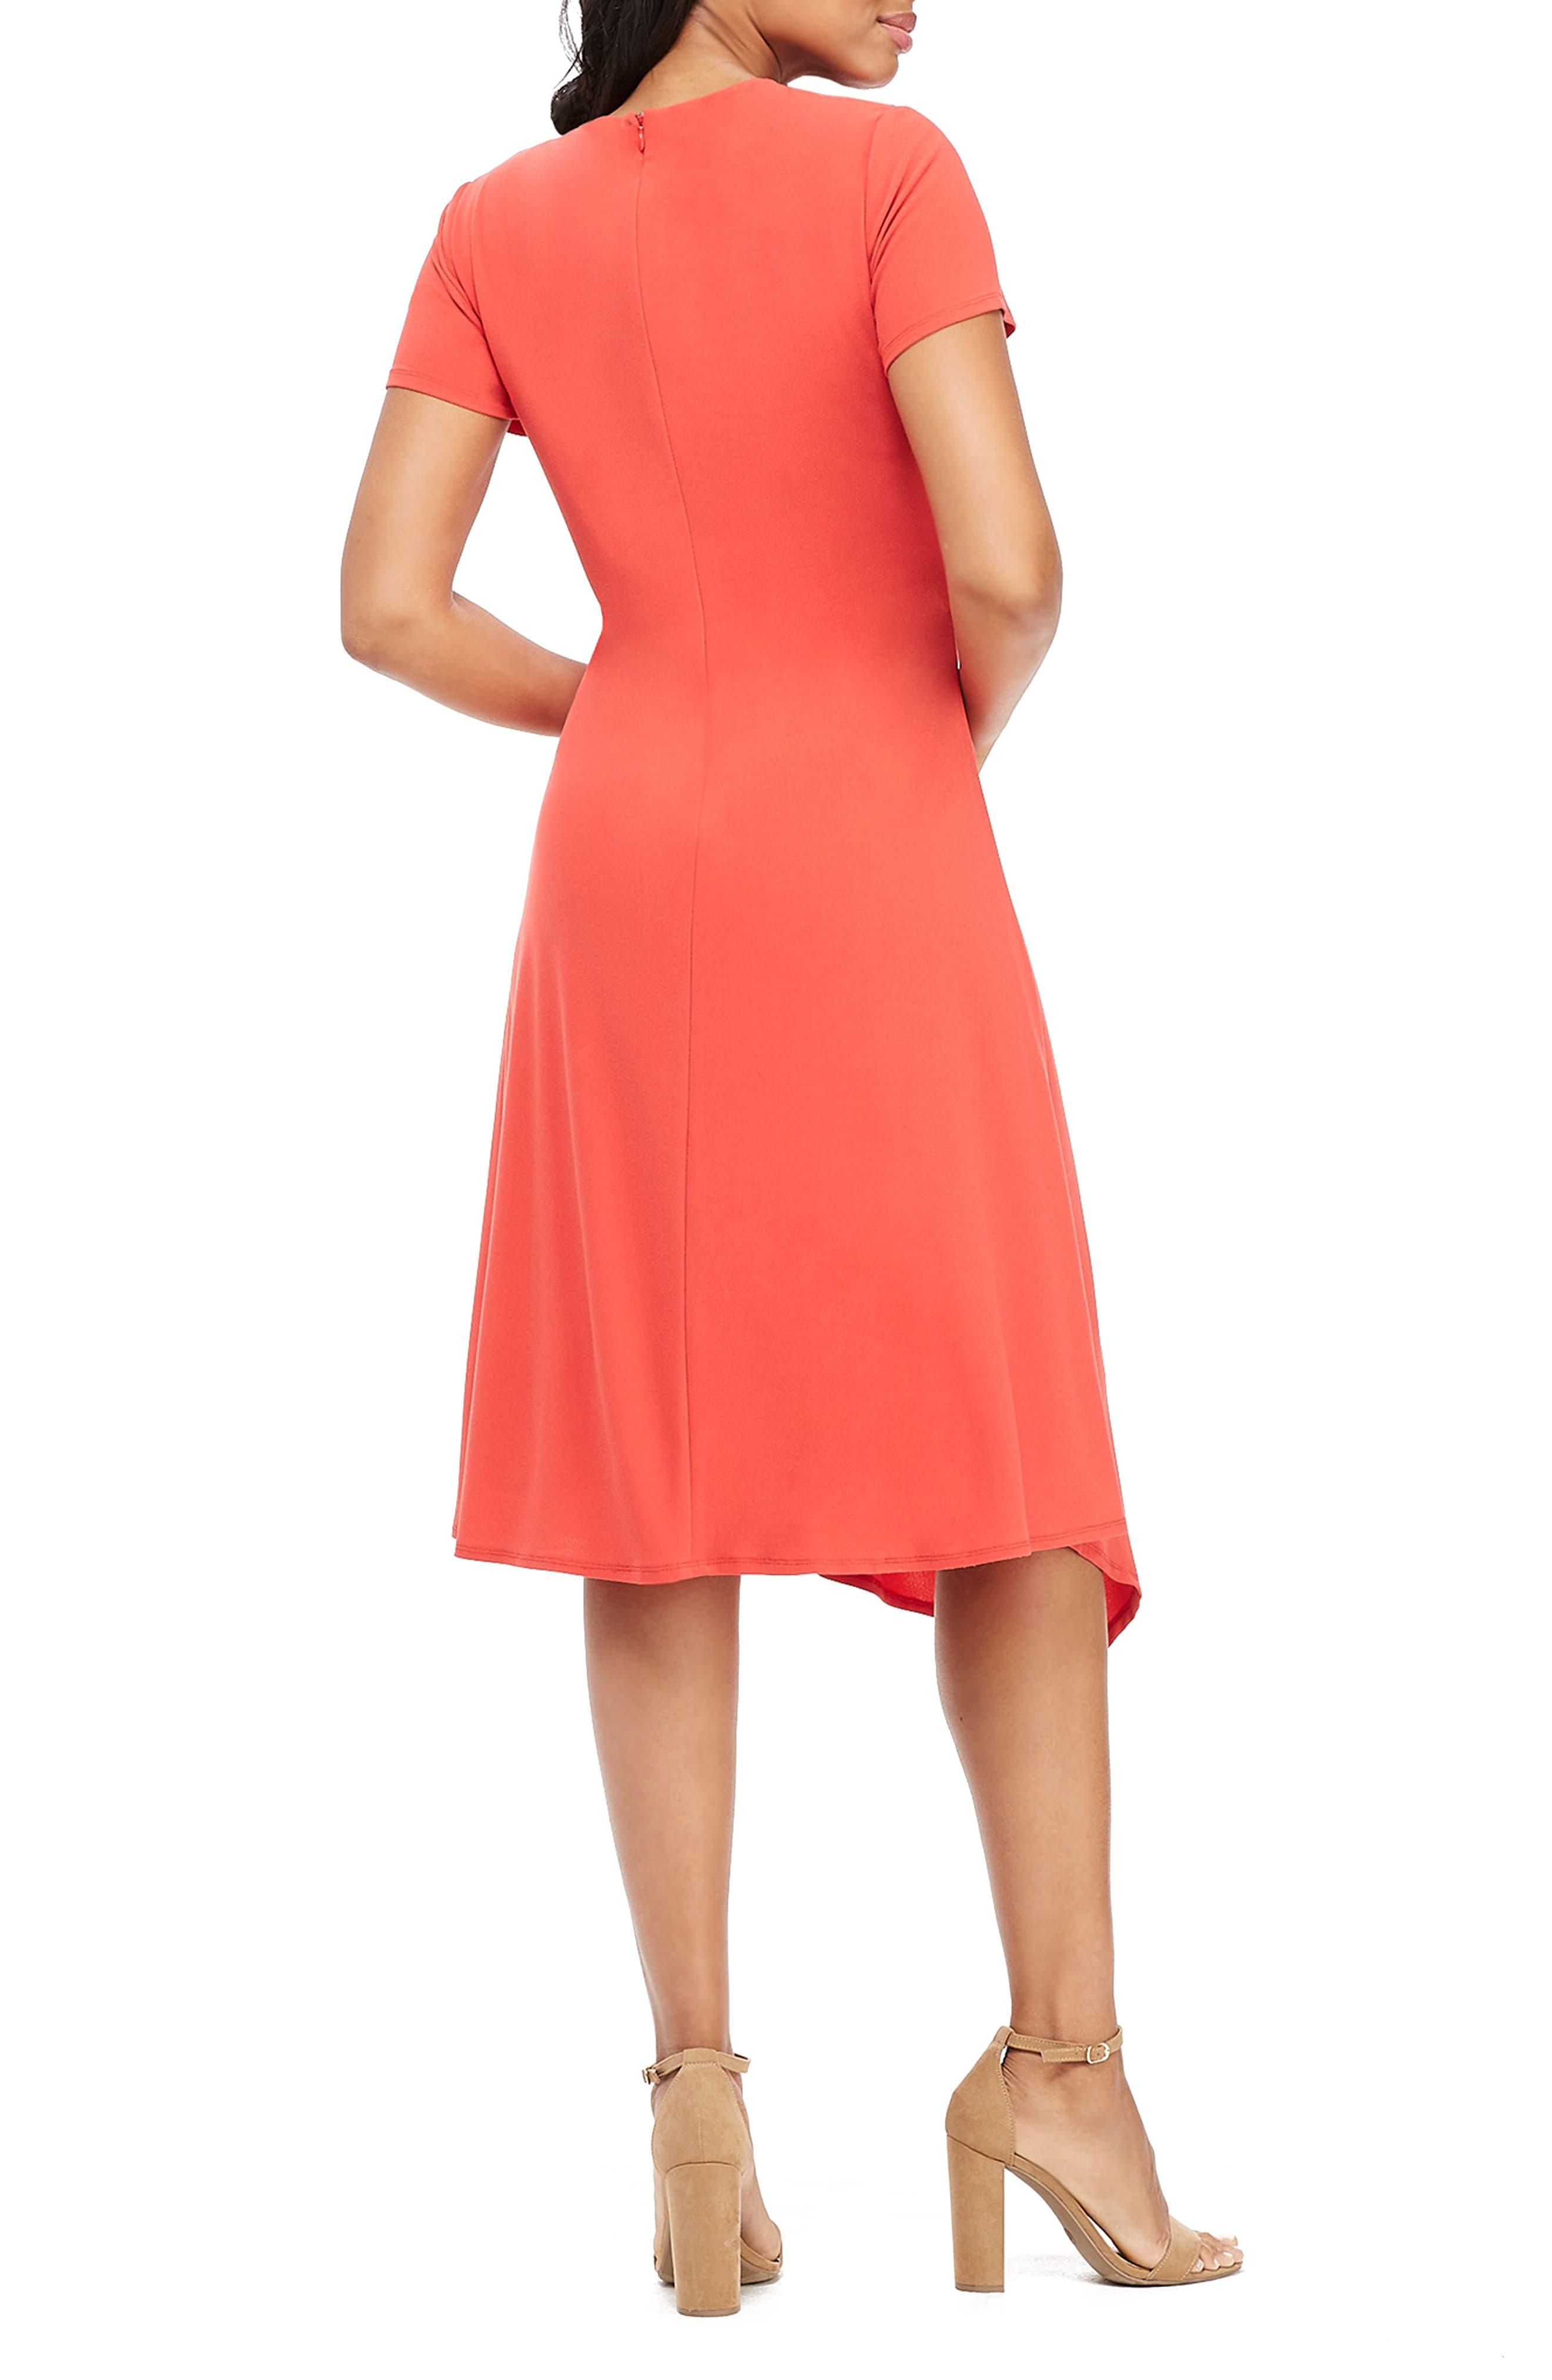 MAGGY LONDON, Draped Asymmetrical Dress, Alternate thumbnail 2, color, FIESTA RED